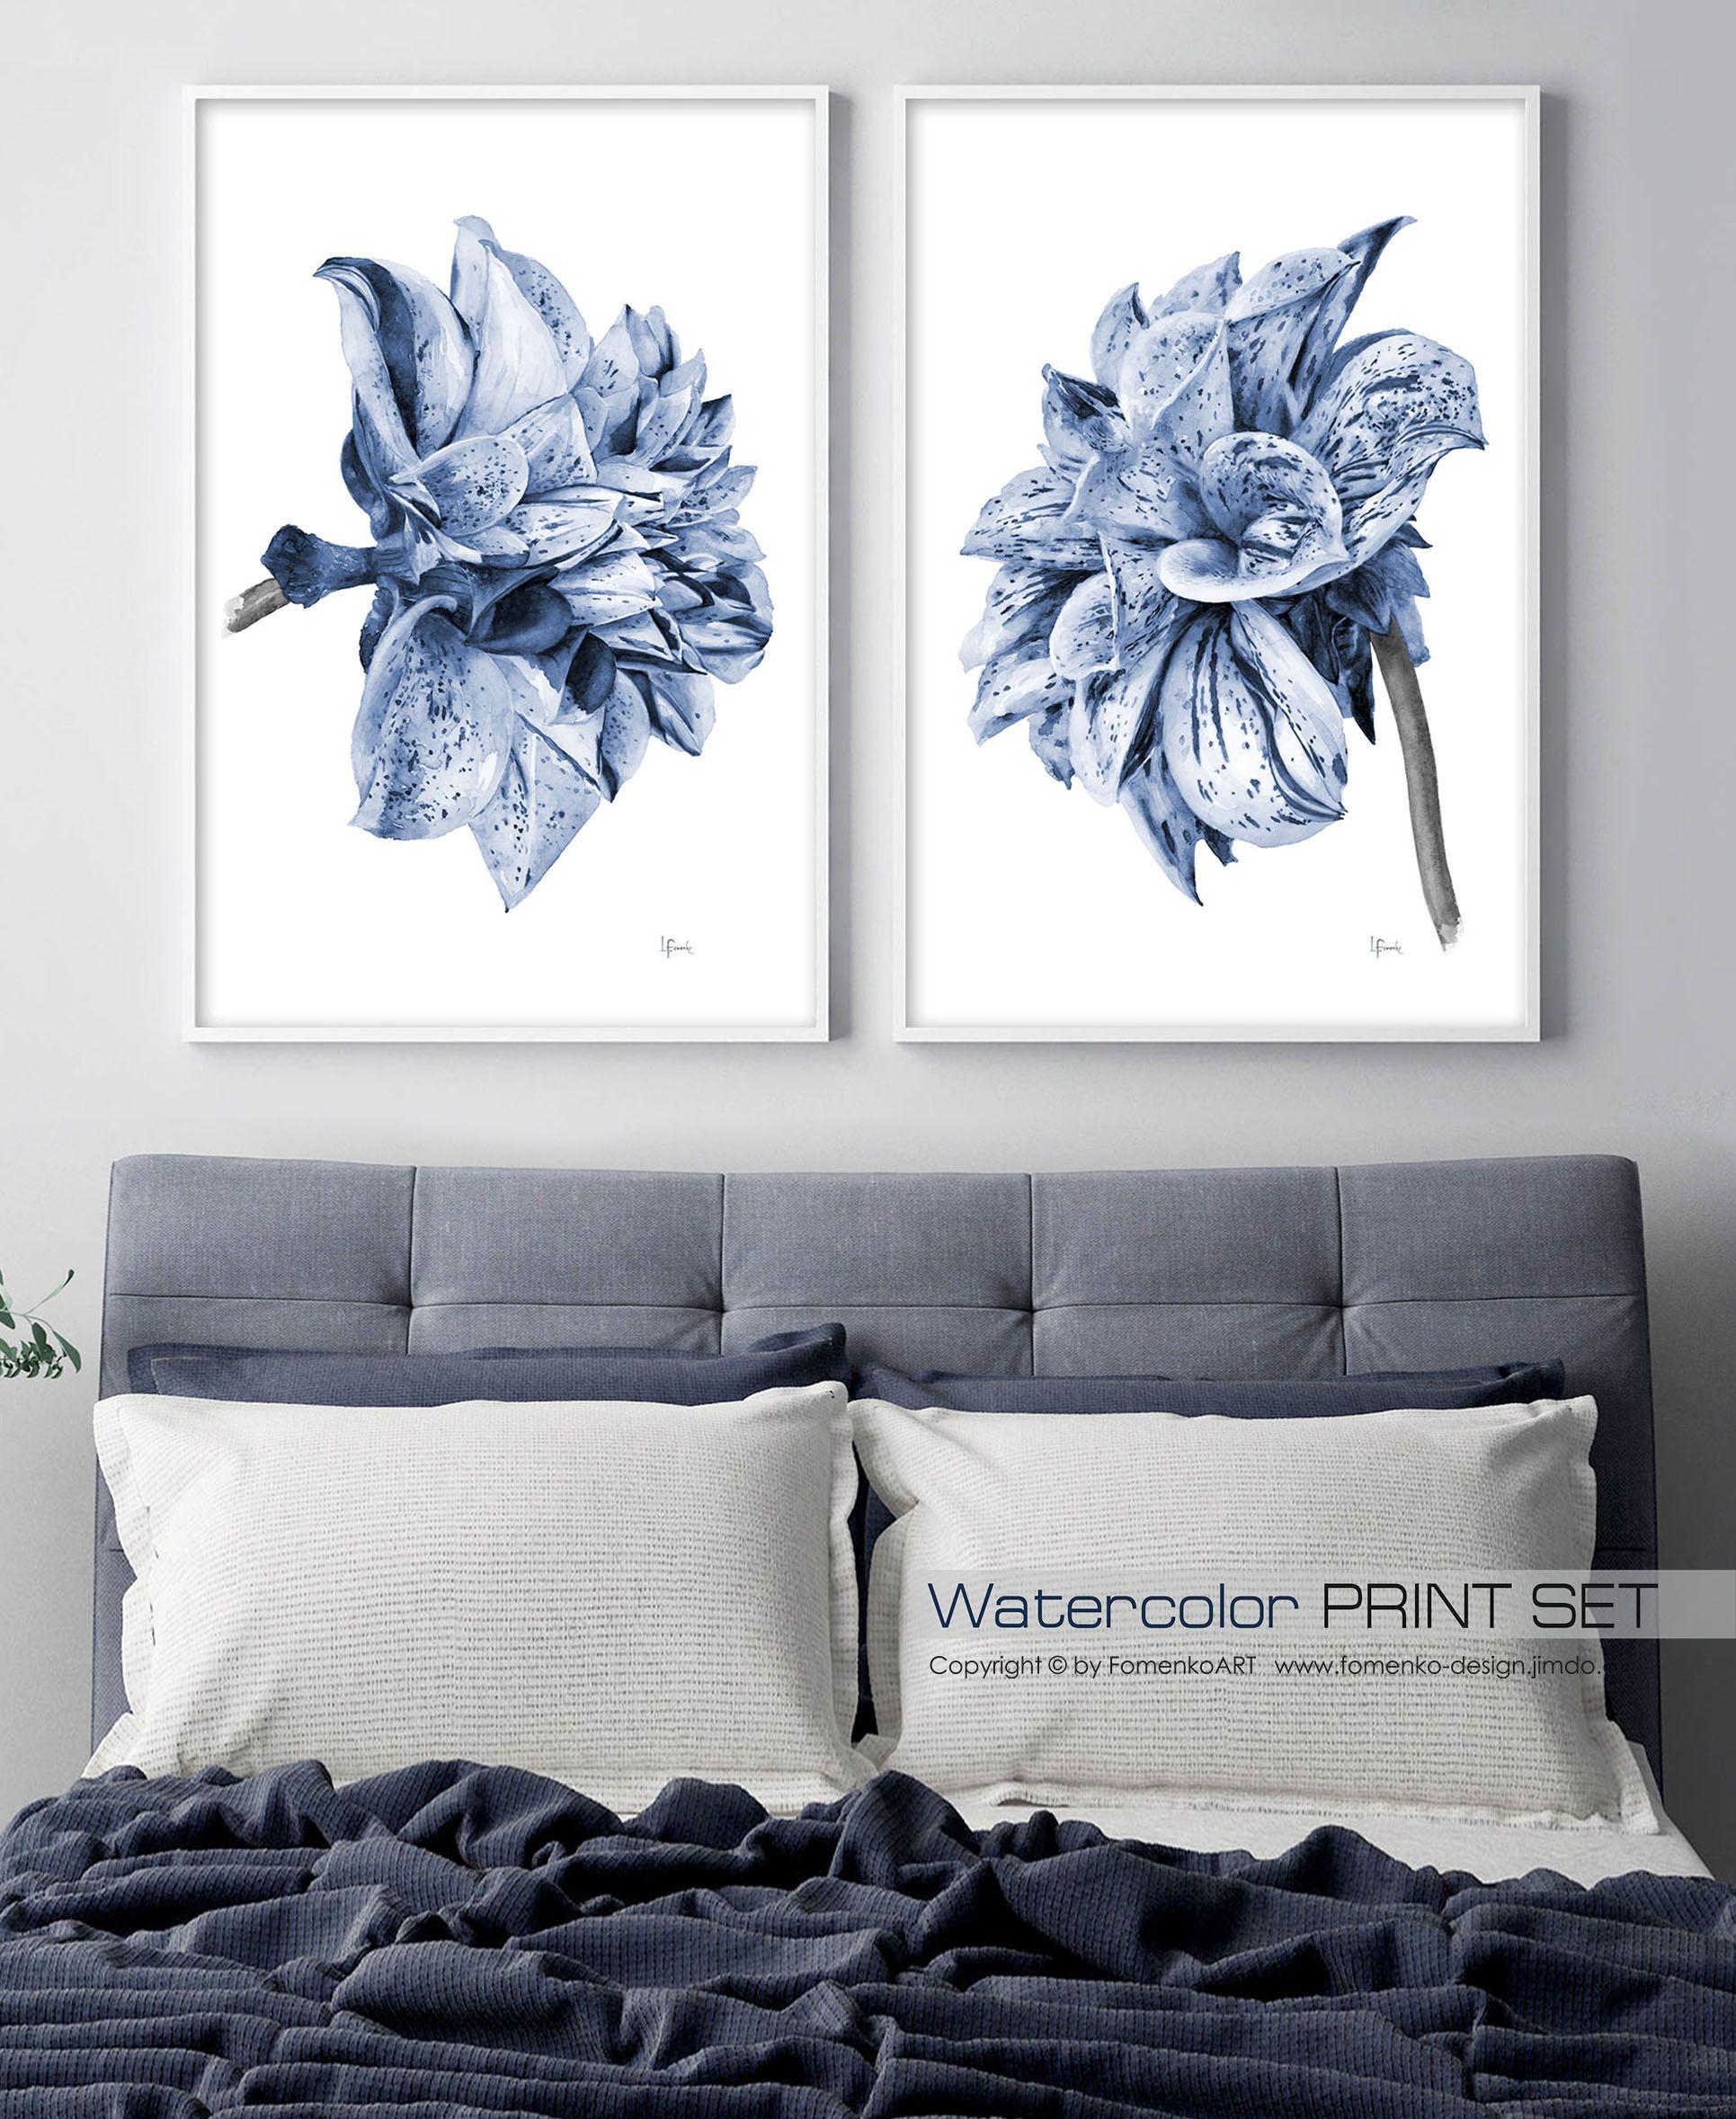 Watercolor Painting Dahlia Flower Art Print Set Of 2 Large Wall Prints Decor Bedroom Living Room F